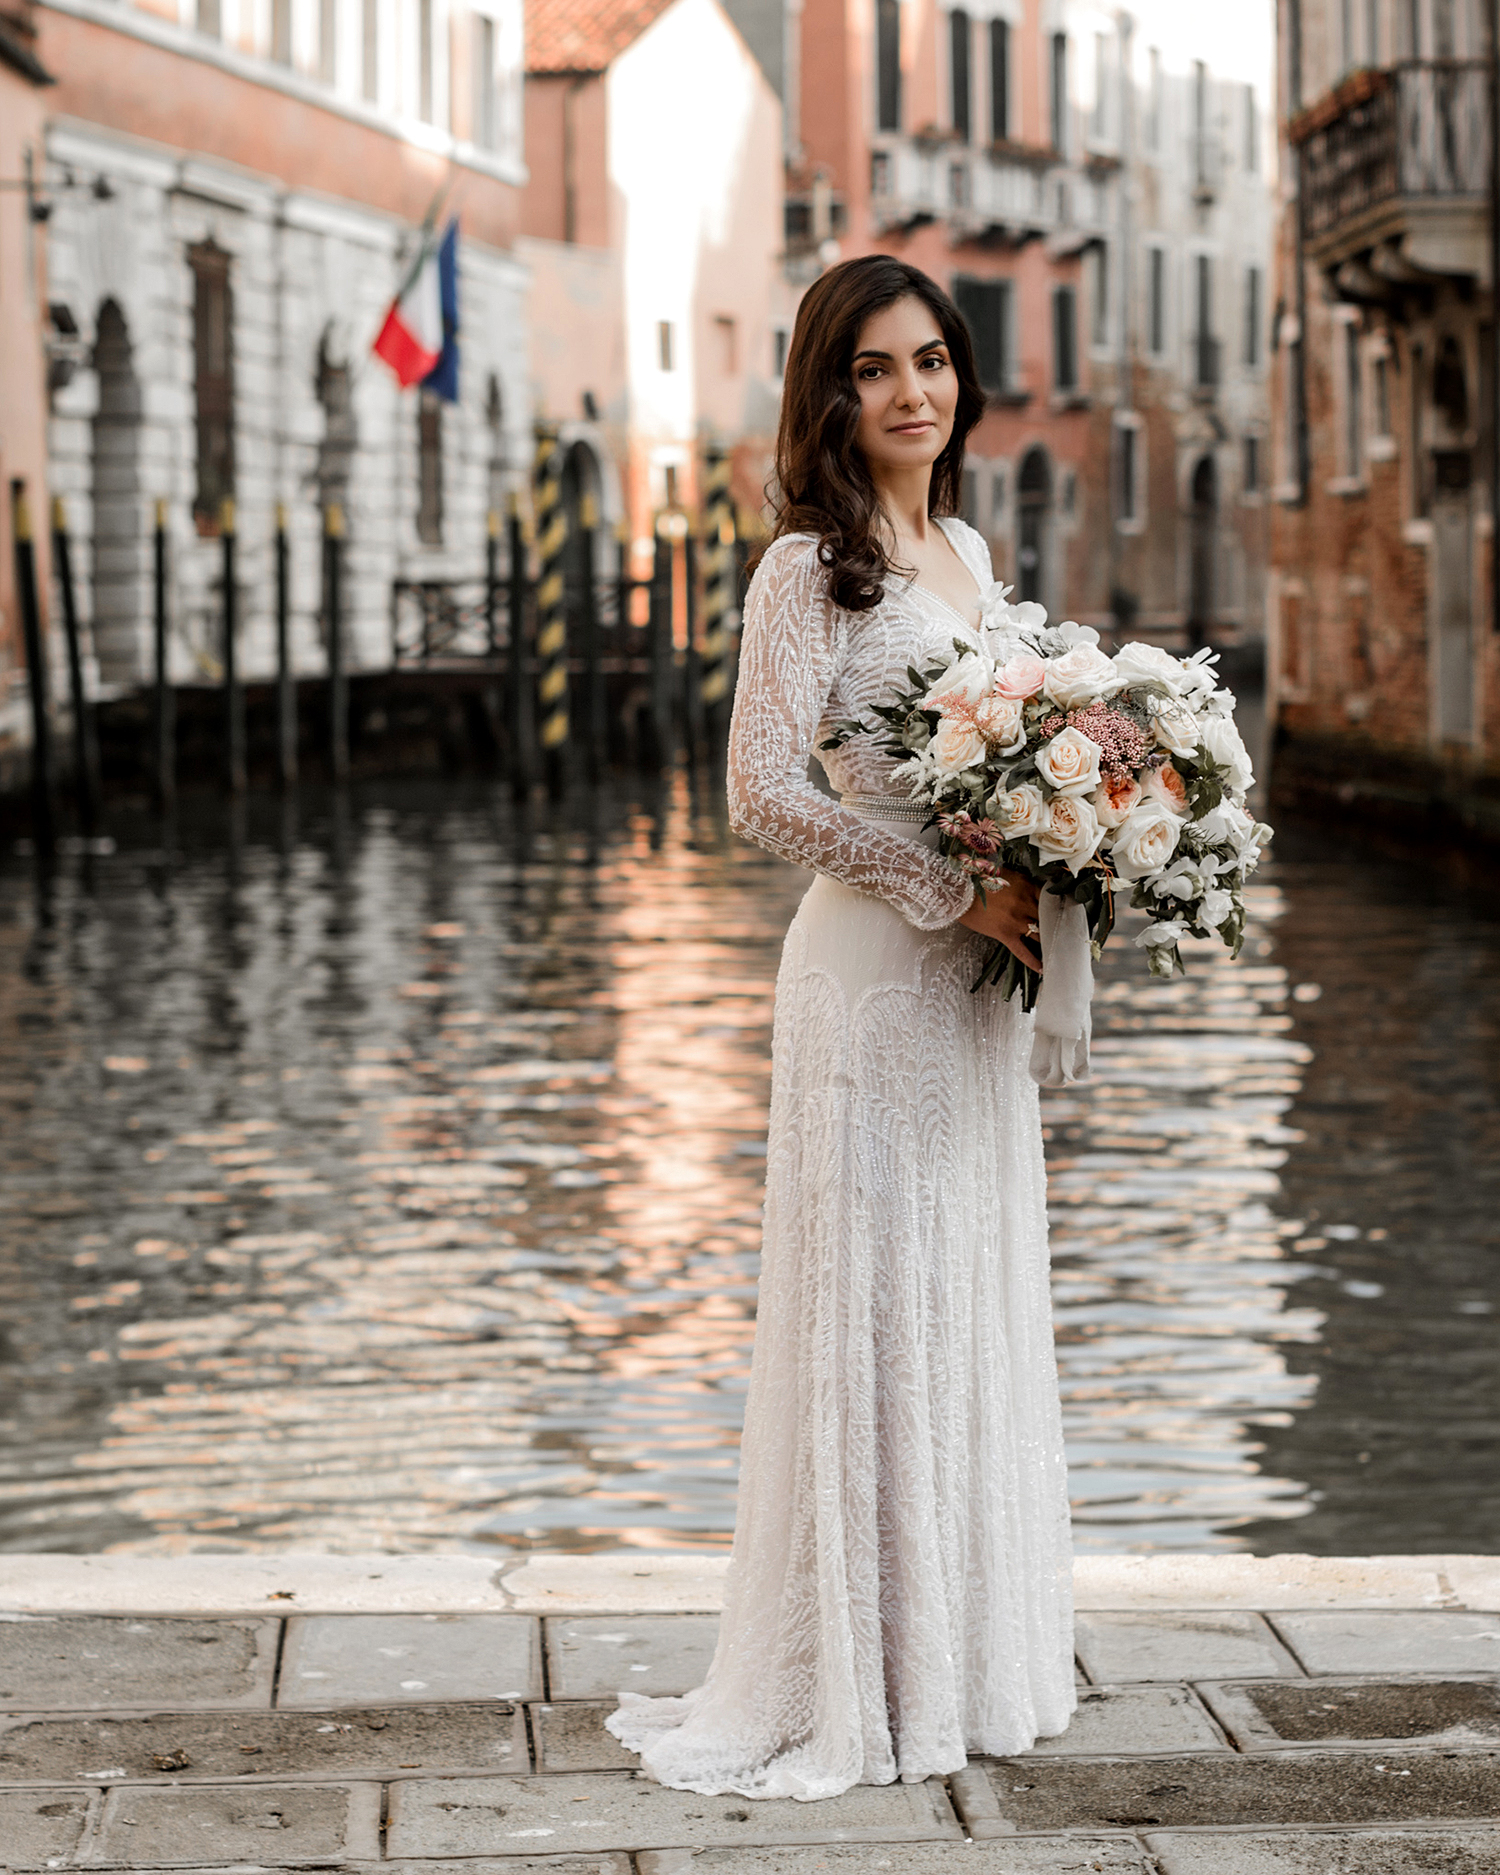 elle raymond venice wedding bridal bouquet